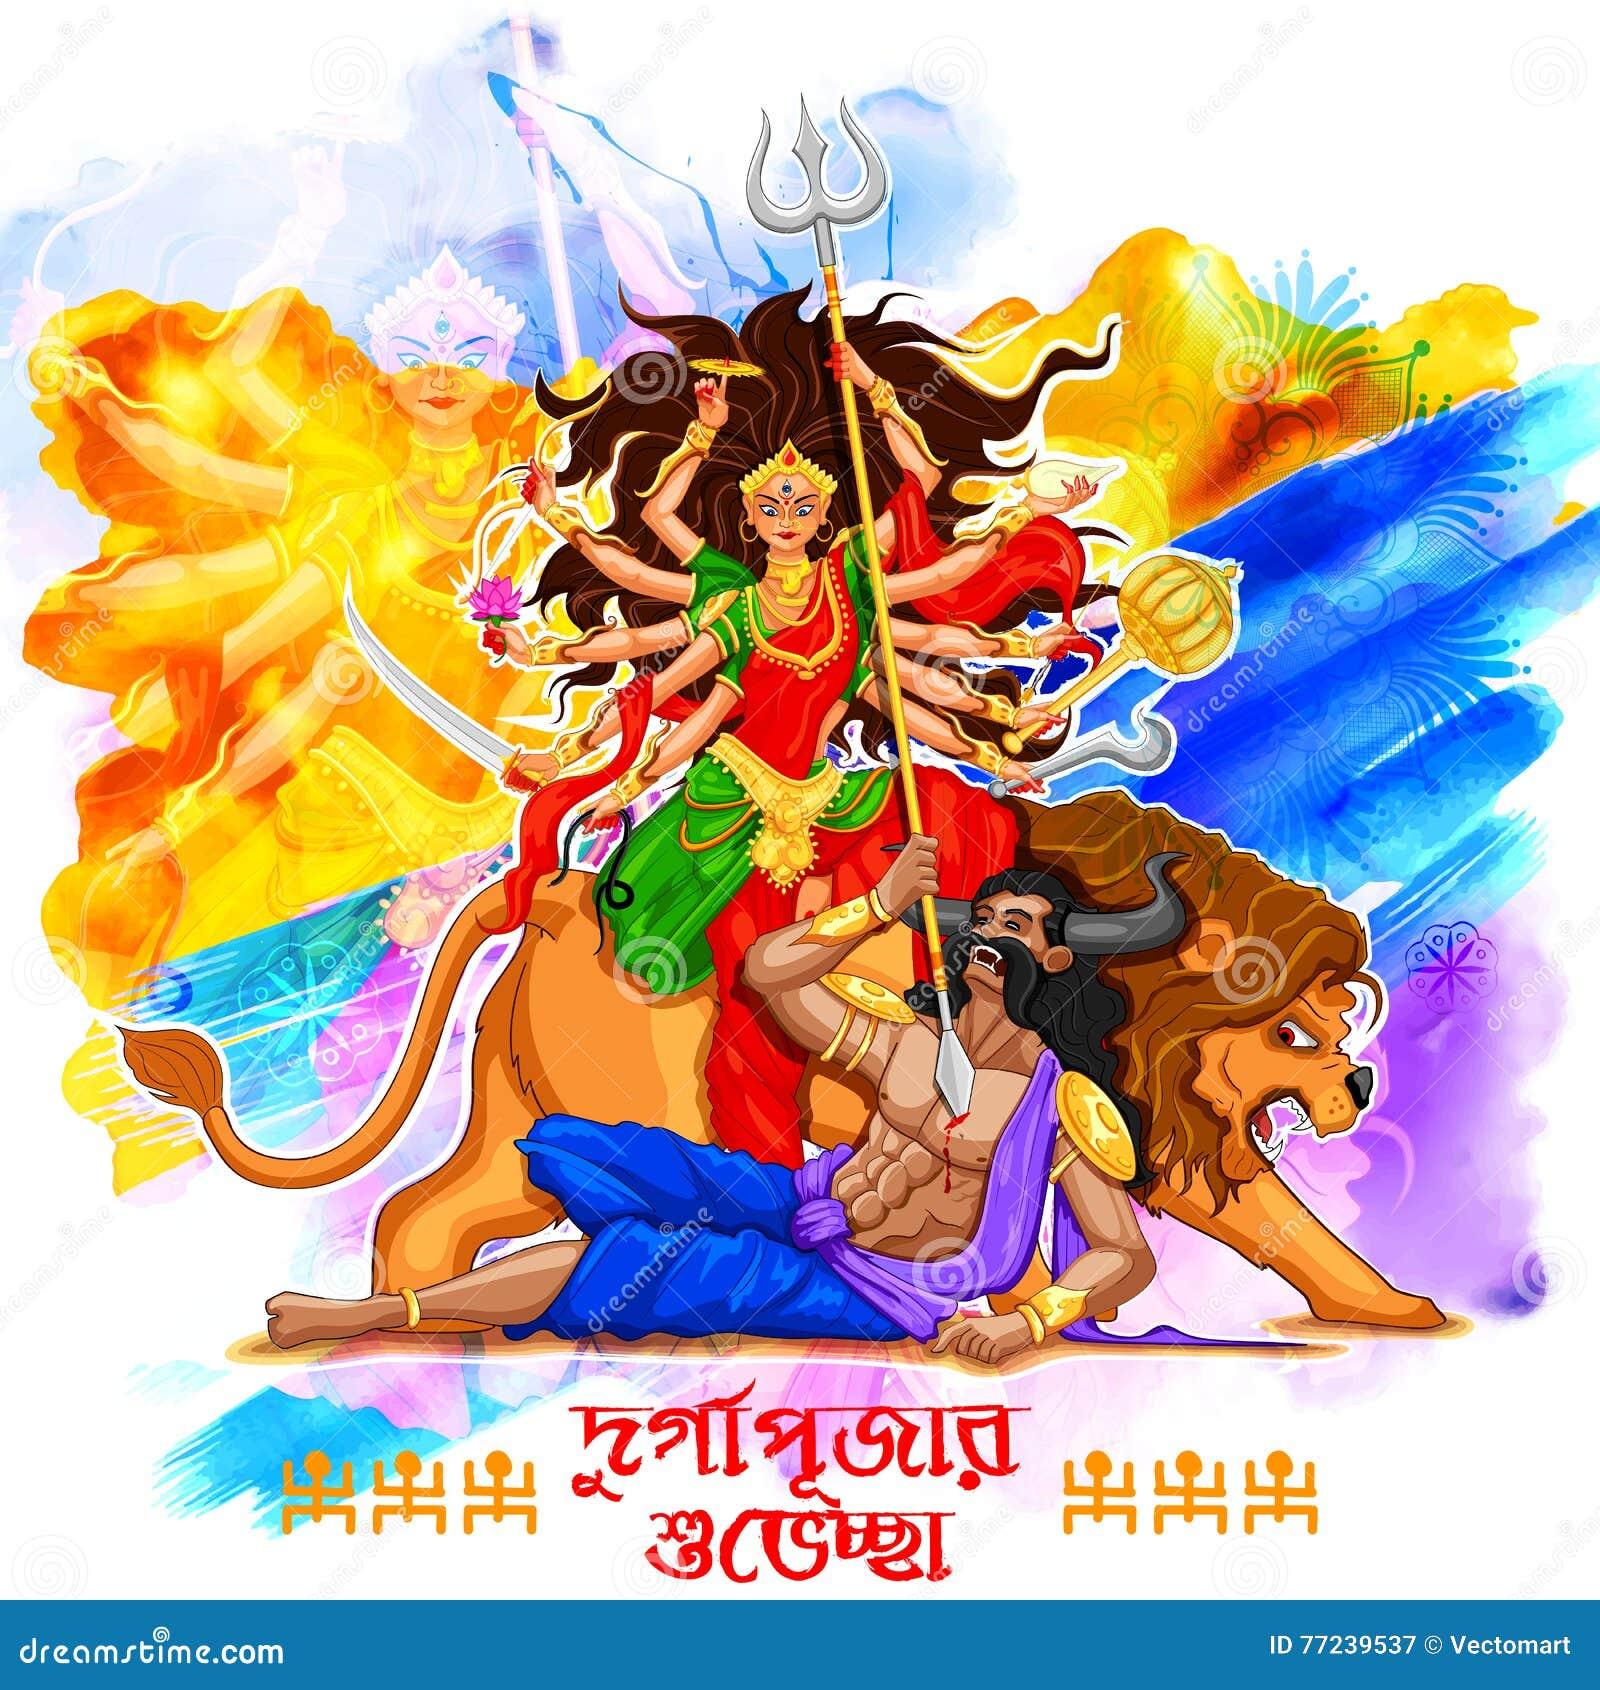 Goddess Durga In Subho Bijoya Happy Dussehra Background Stock Vector